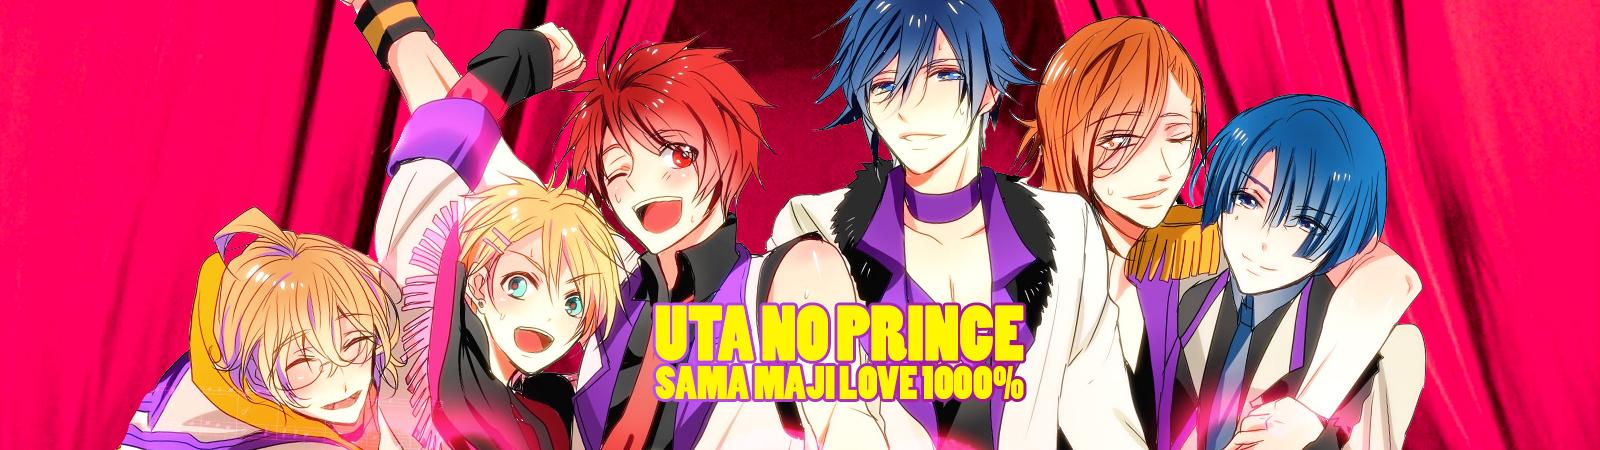 Uta No Prince Sama Maji Love 1000%